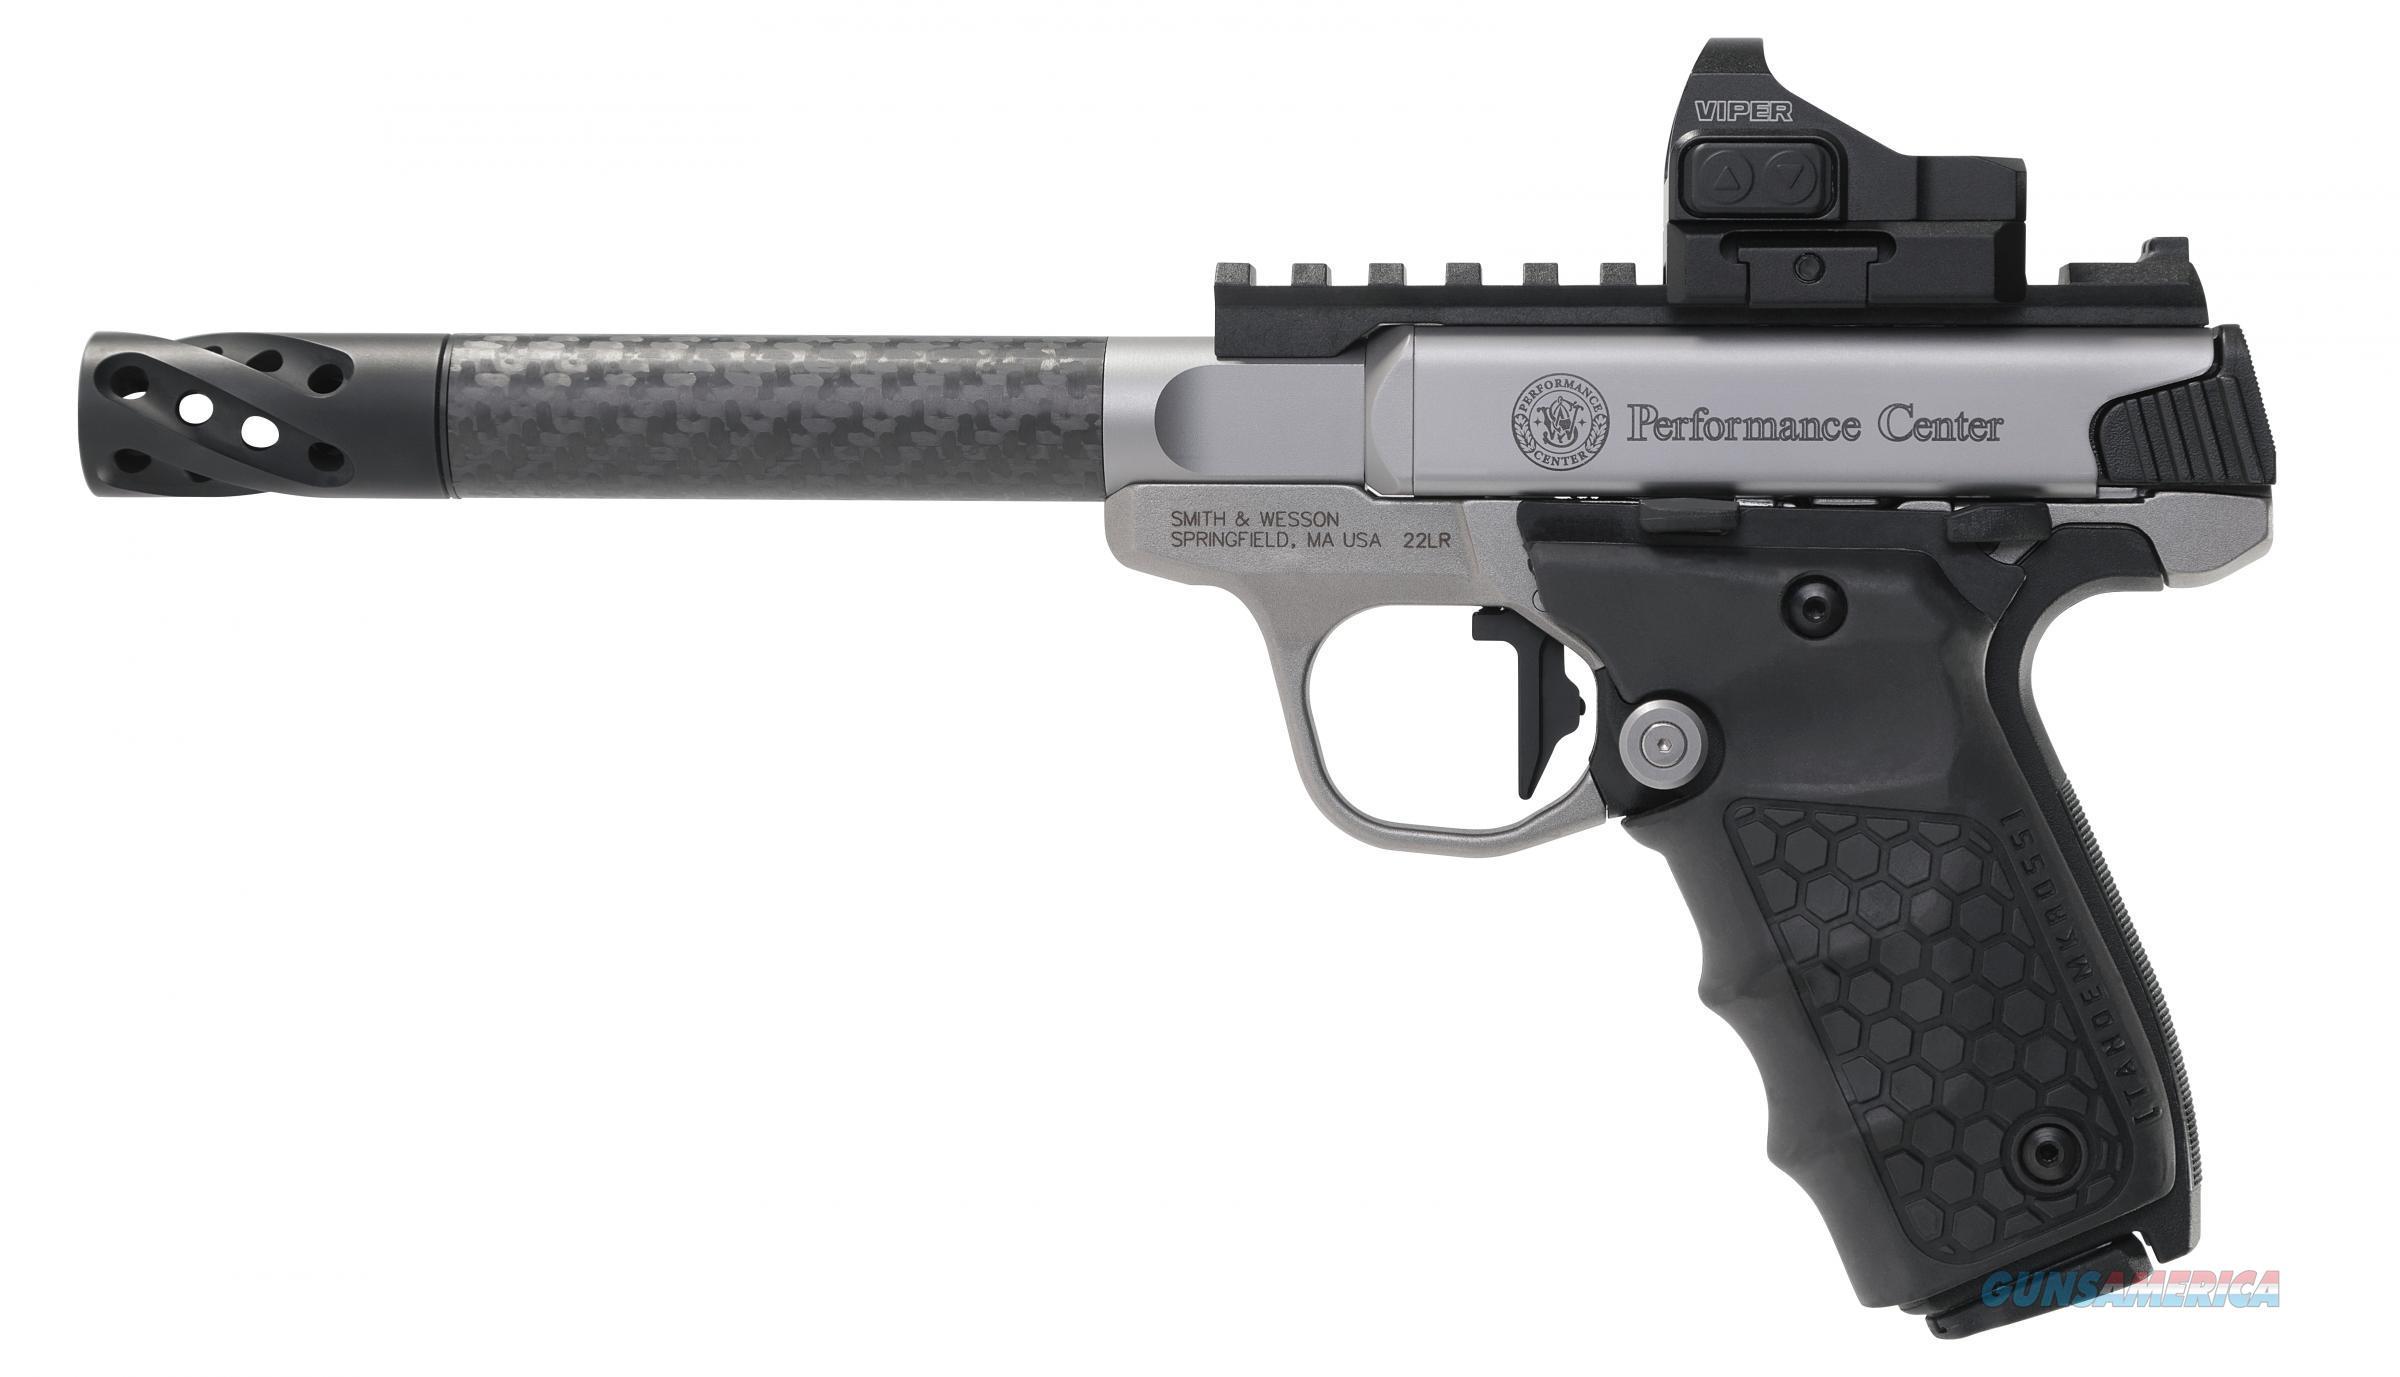 Smith & Wesson SW22 Performance Center Victory .22 LR Carbon Fiber Target Barrel Vortex Viper 6MOA Dot 12081 *NEW*  Guns > Pistols > Smith & Wesson Pistols - Autos > .22 Autos